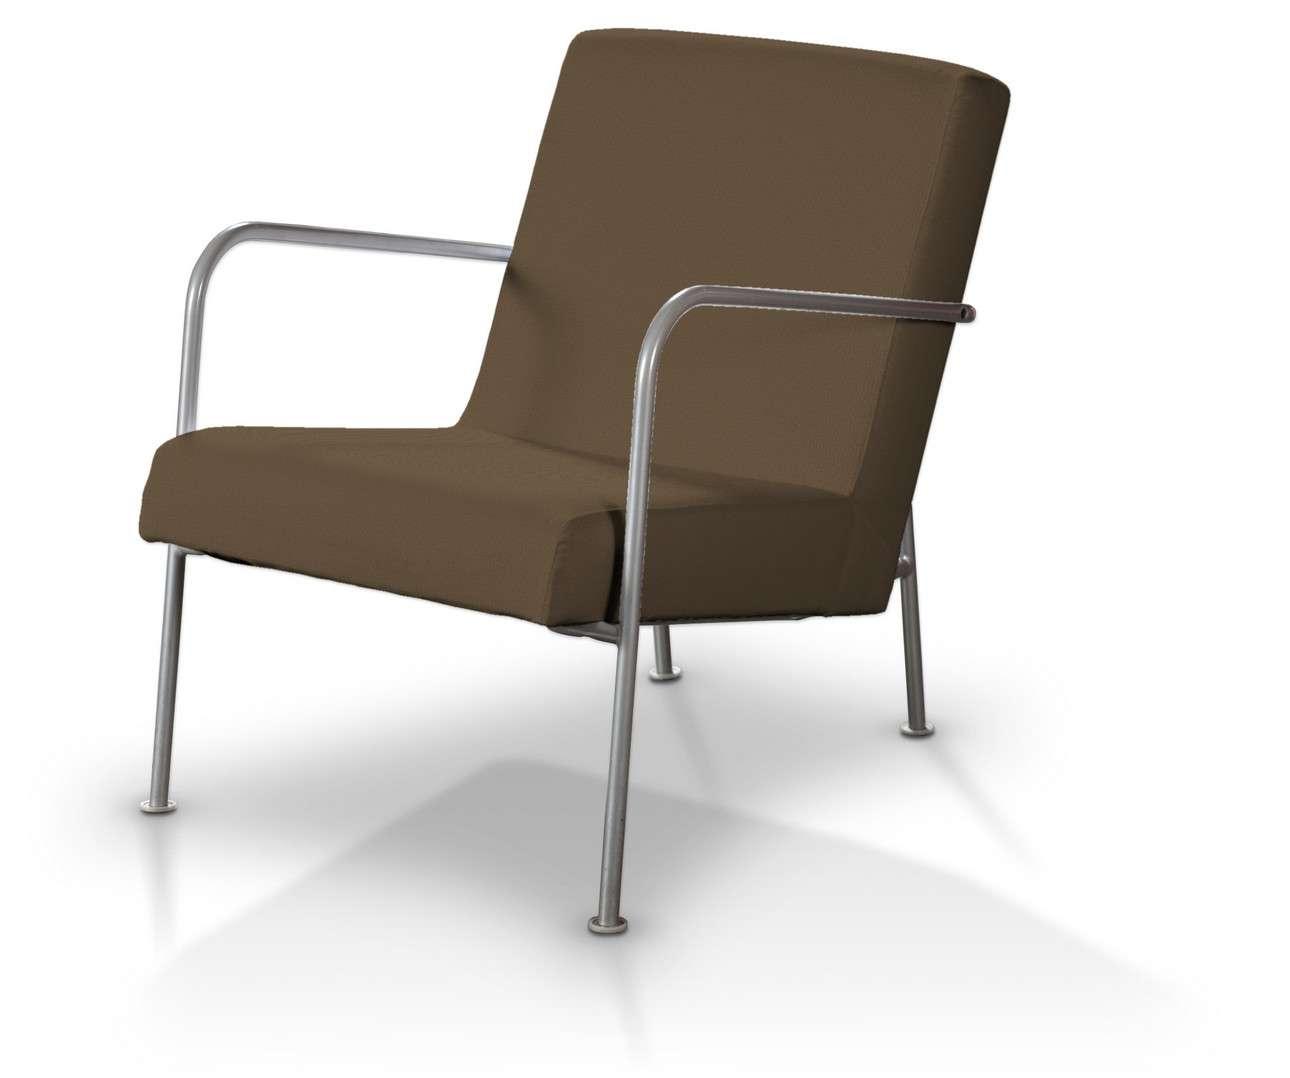 Potah na křeslo Ikea PS v kolekci Living II, látka: 160-94